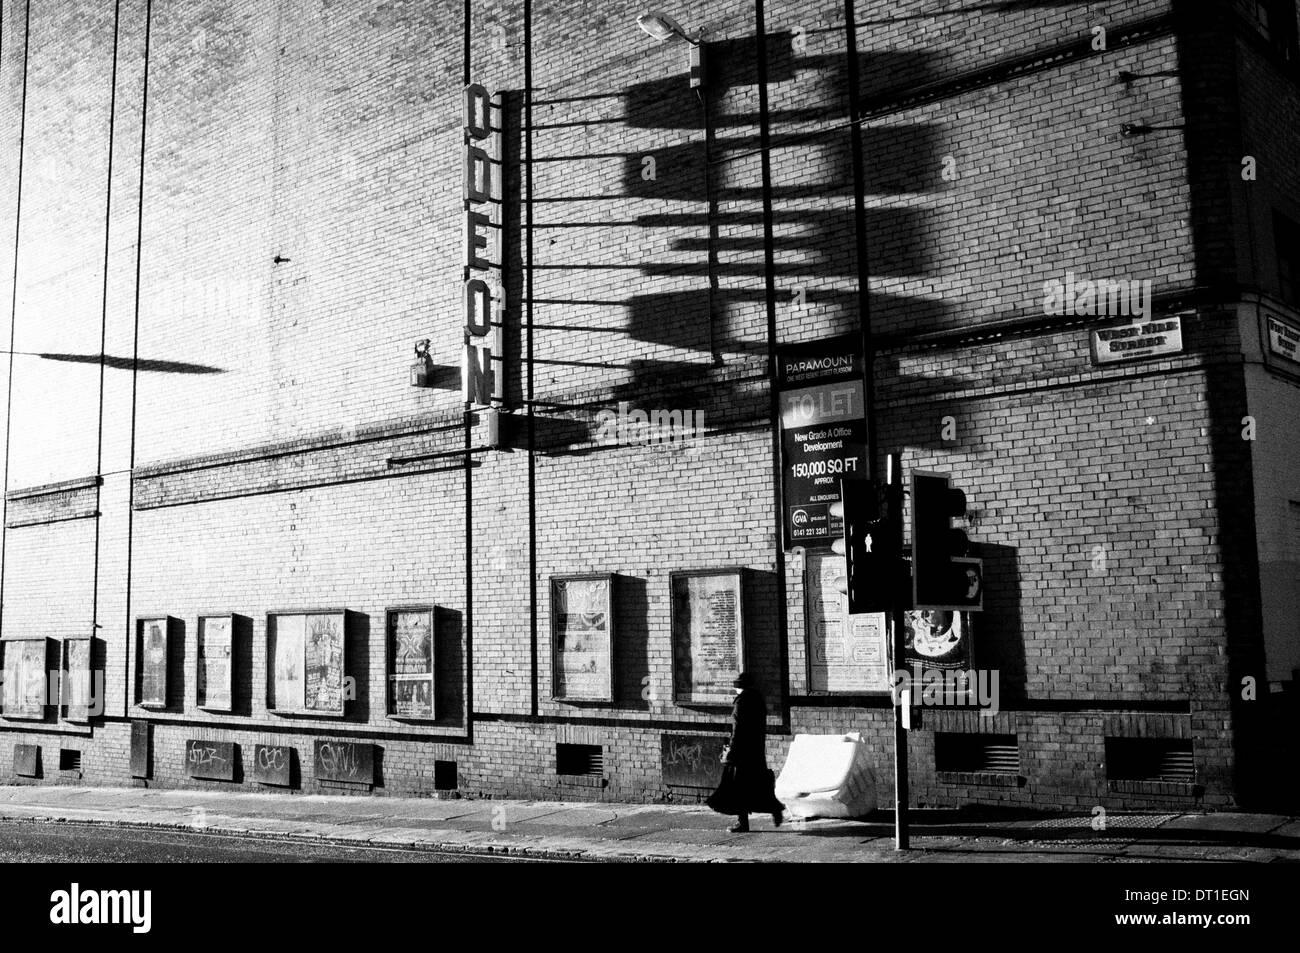 Shadows on wall of now demolished art deco era Odeon Cinema on Renfield Street in Glasgow, Scotland - Stock Image